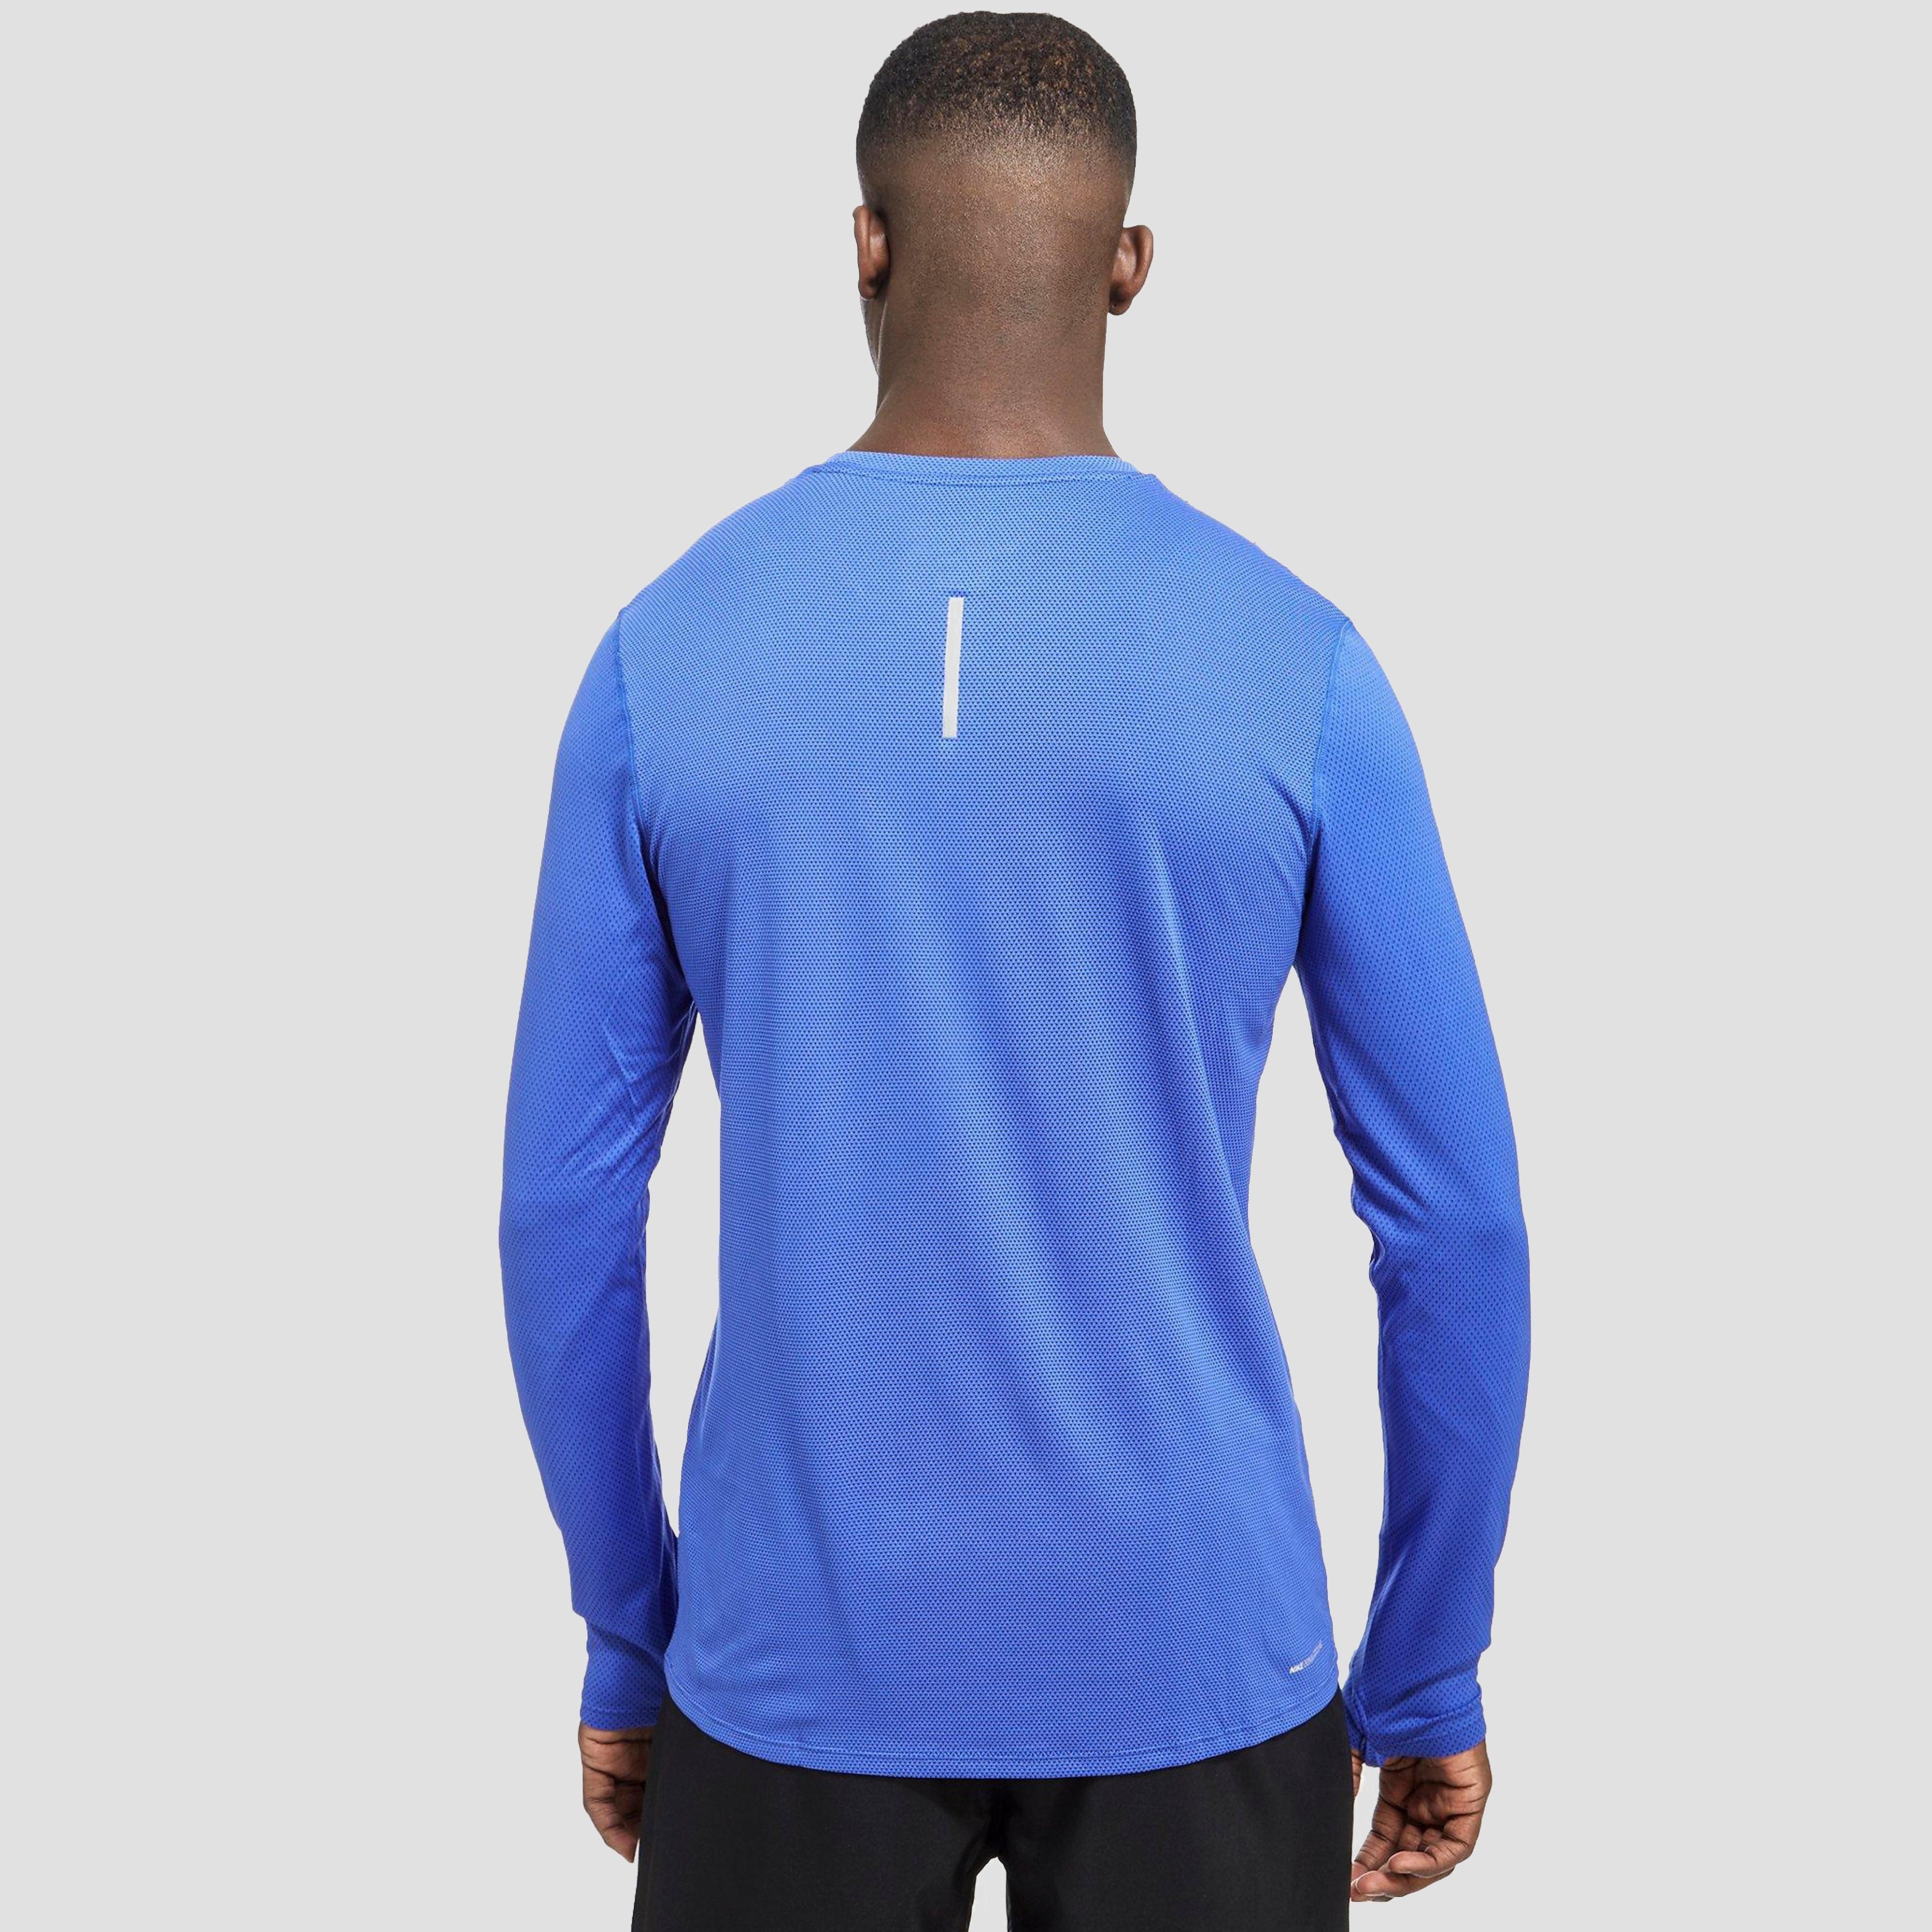 Nike Zonal Cooling Relay Long-Sleeve Men's Running Top